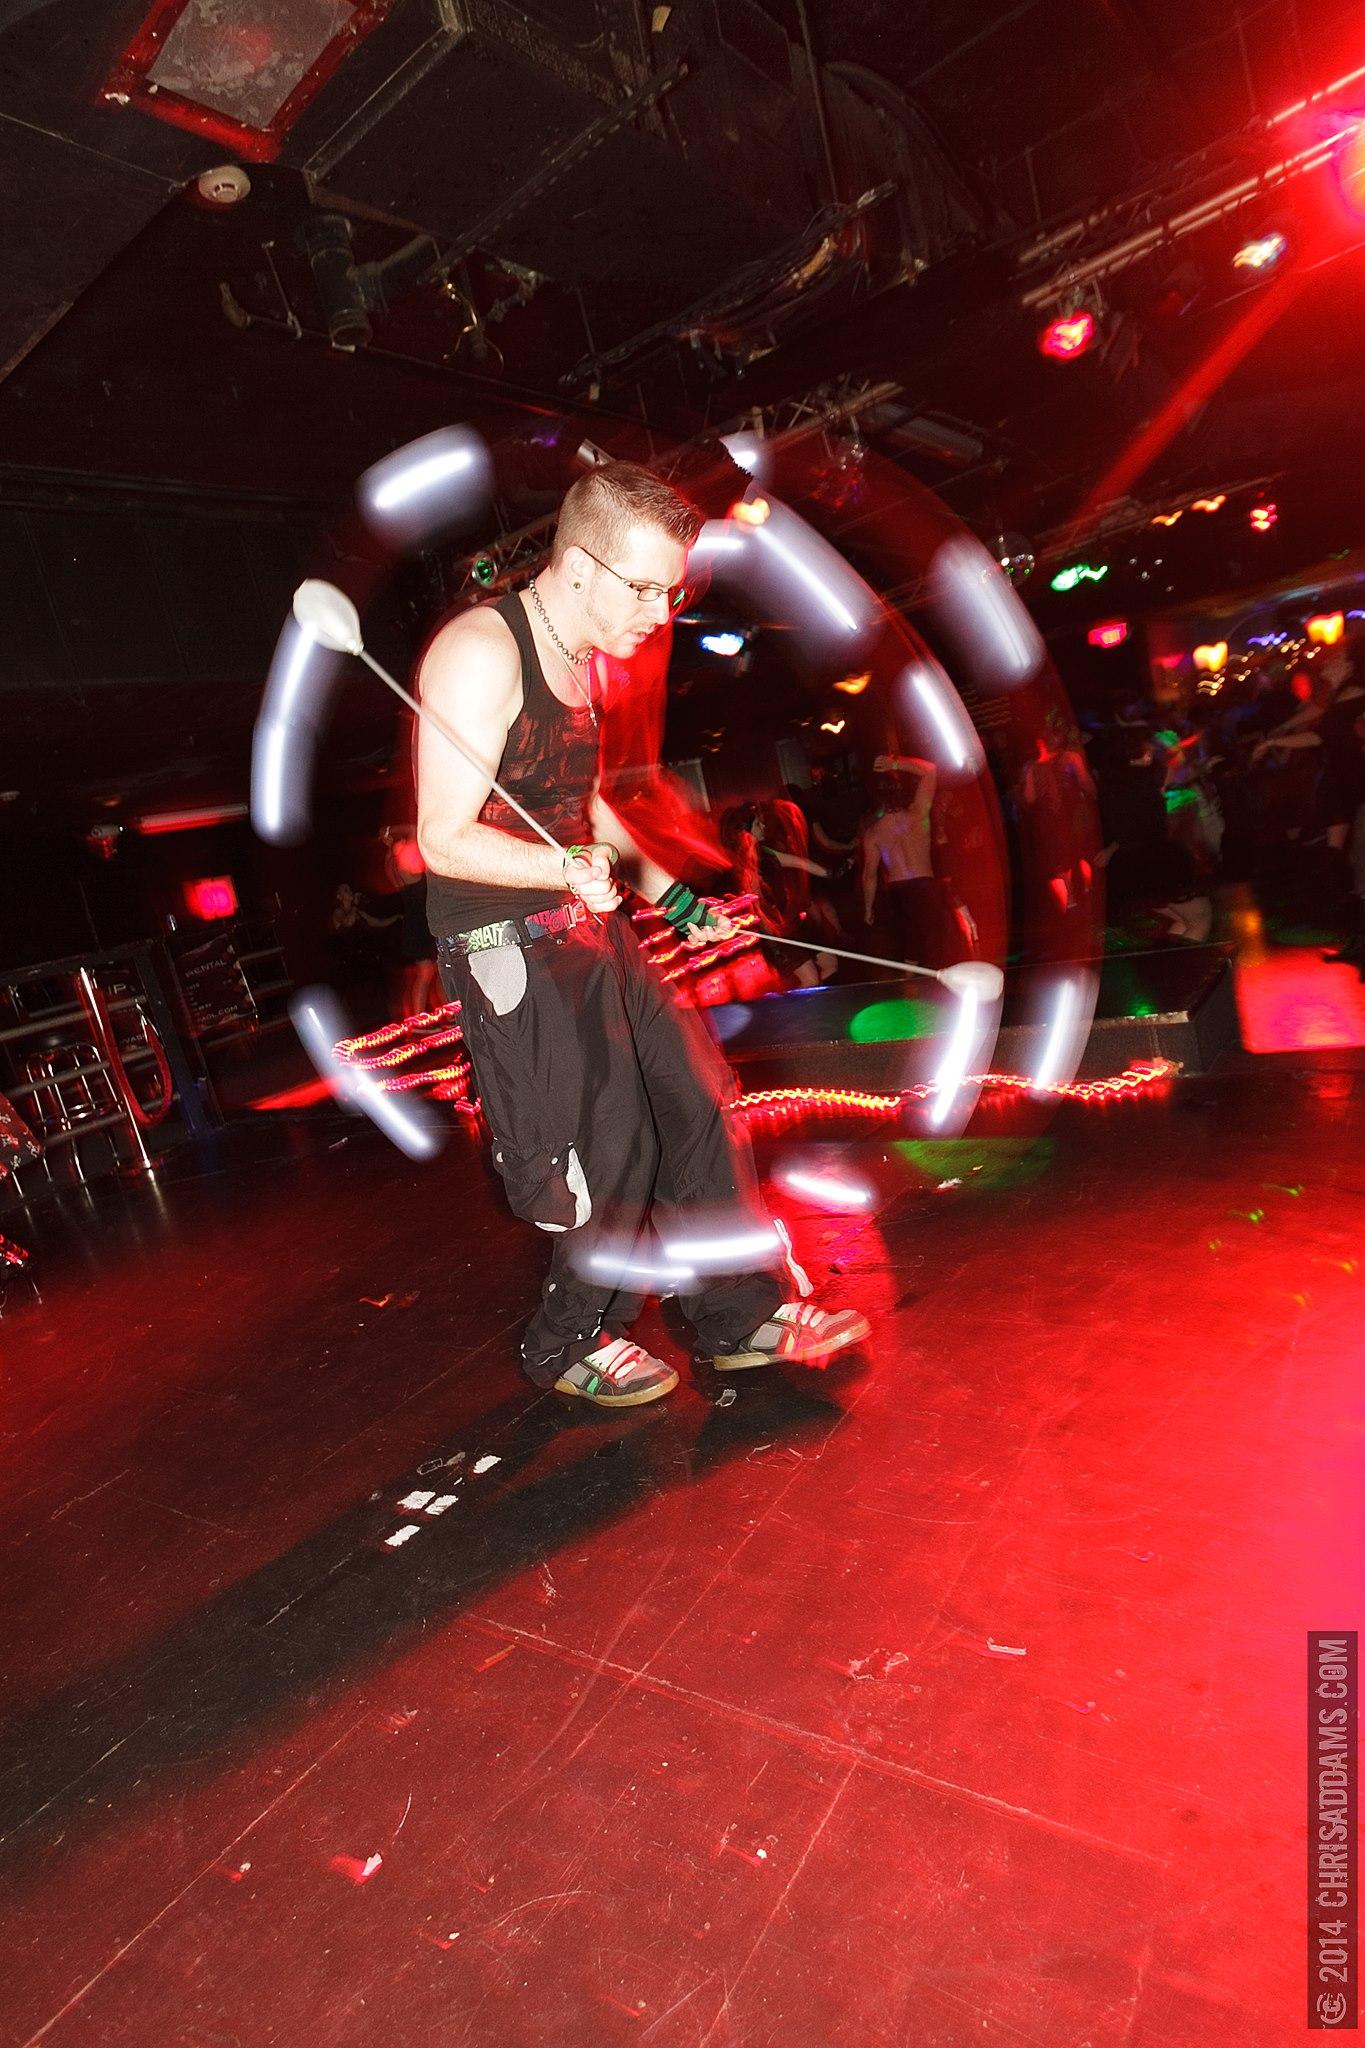 TheHavenClub-Goth-Industrial-Dance-Alternative-Northampton-MA (45).jpg